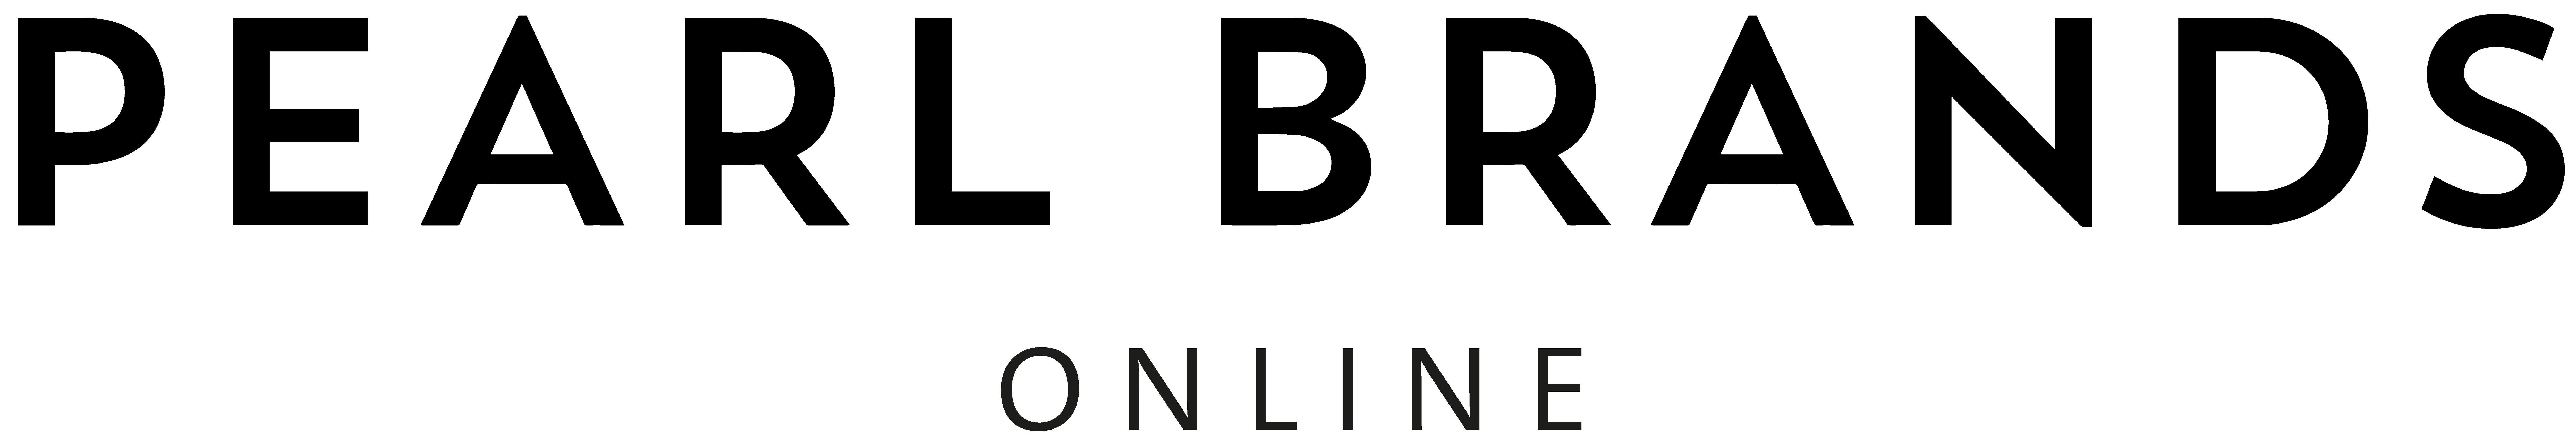 Pearl Brands Online Shop